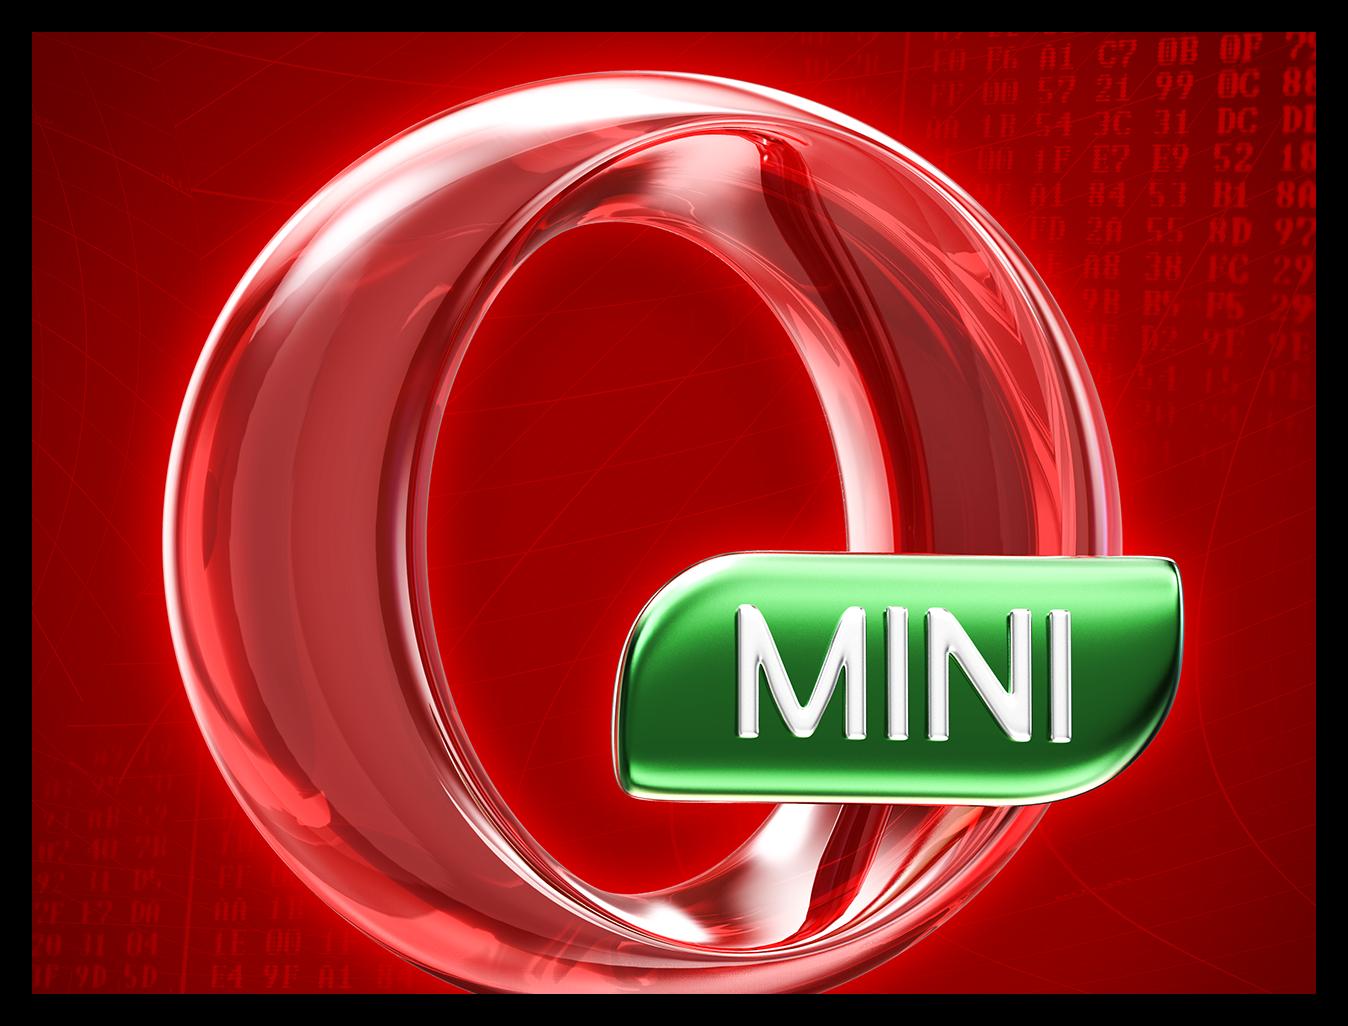 Kartinka-Vse-versii-Opera-Mini.png